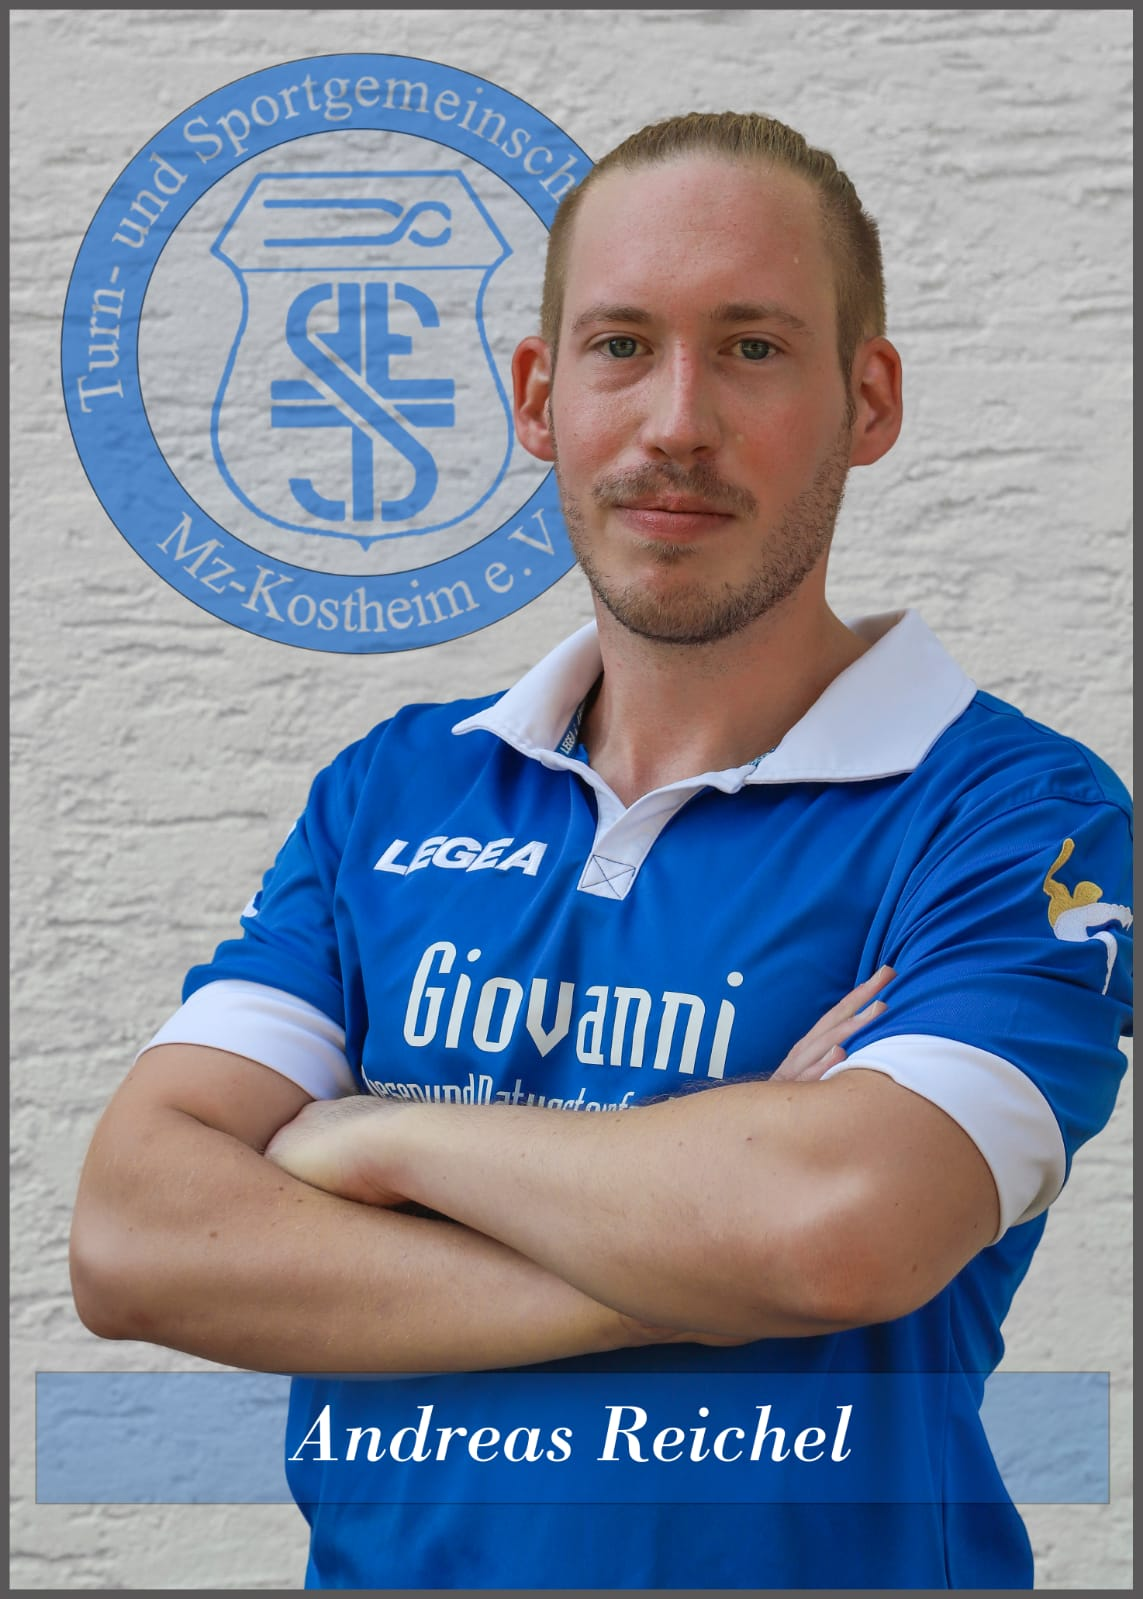 Andreas Reichel